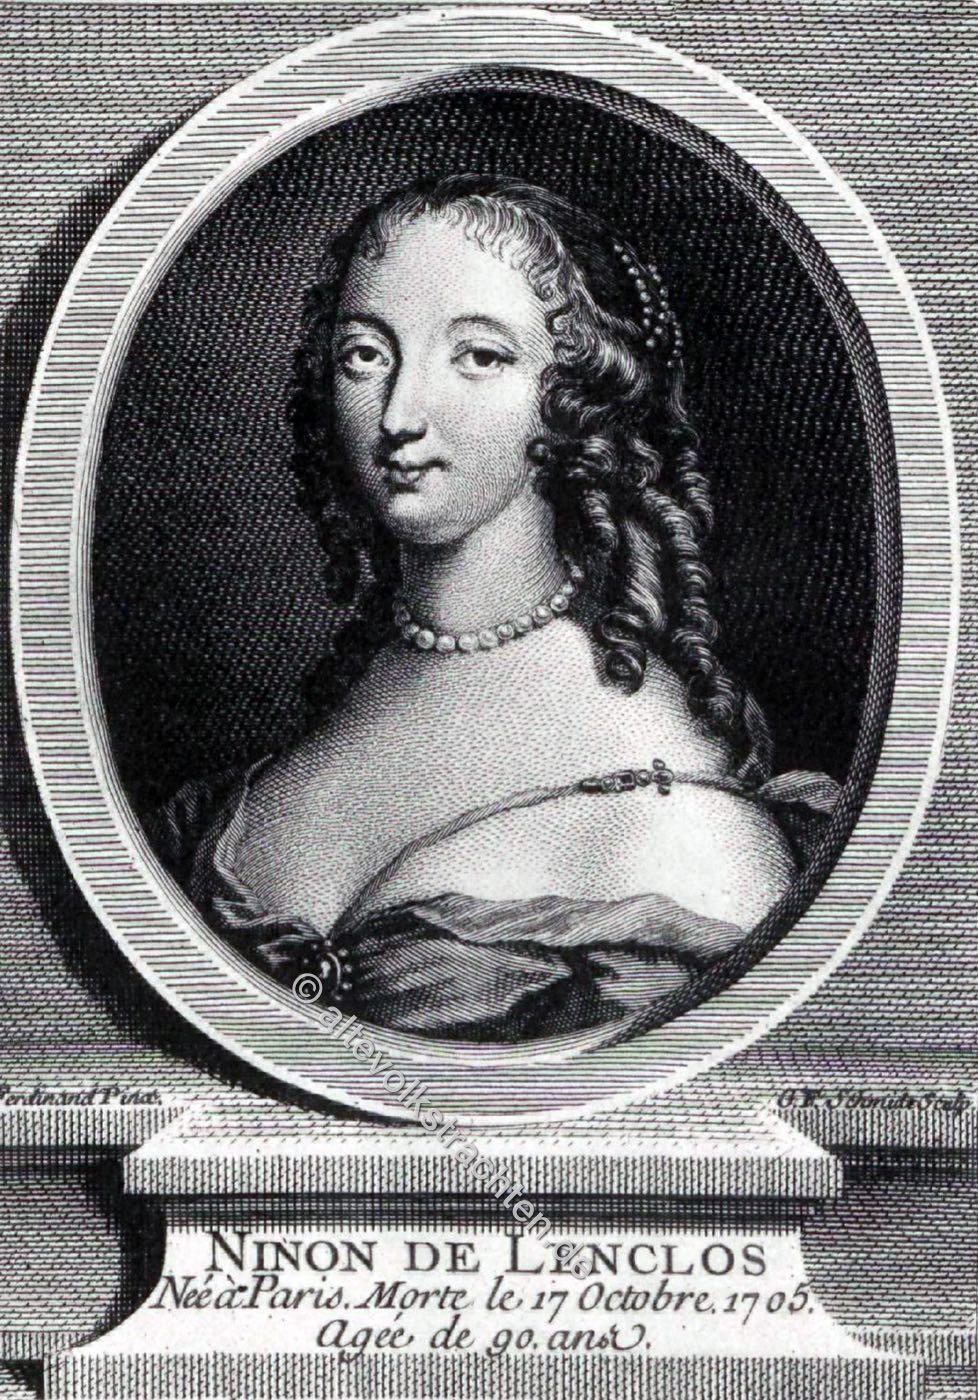 Ninon de Lenclos, Autorin, Louis XIV, Kurtisane, Salonnière, Barock, Mode